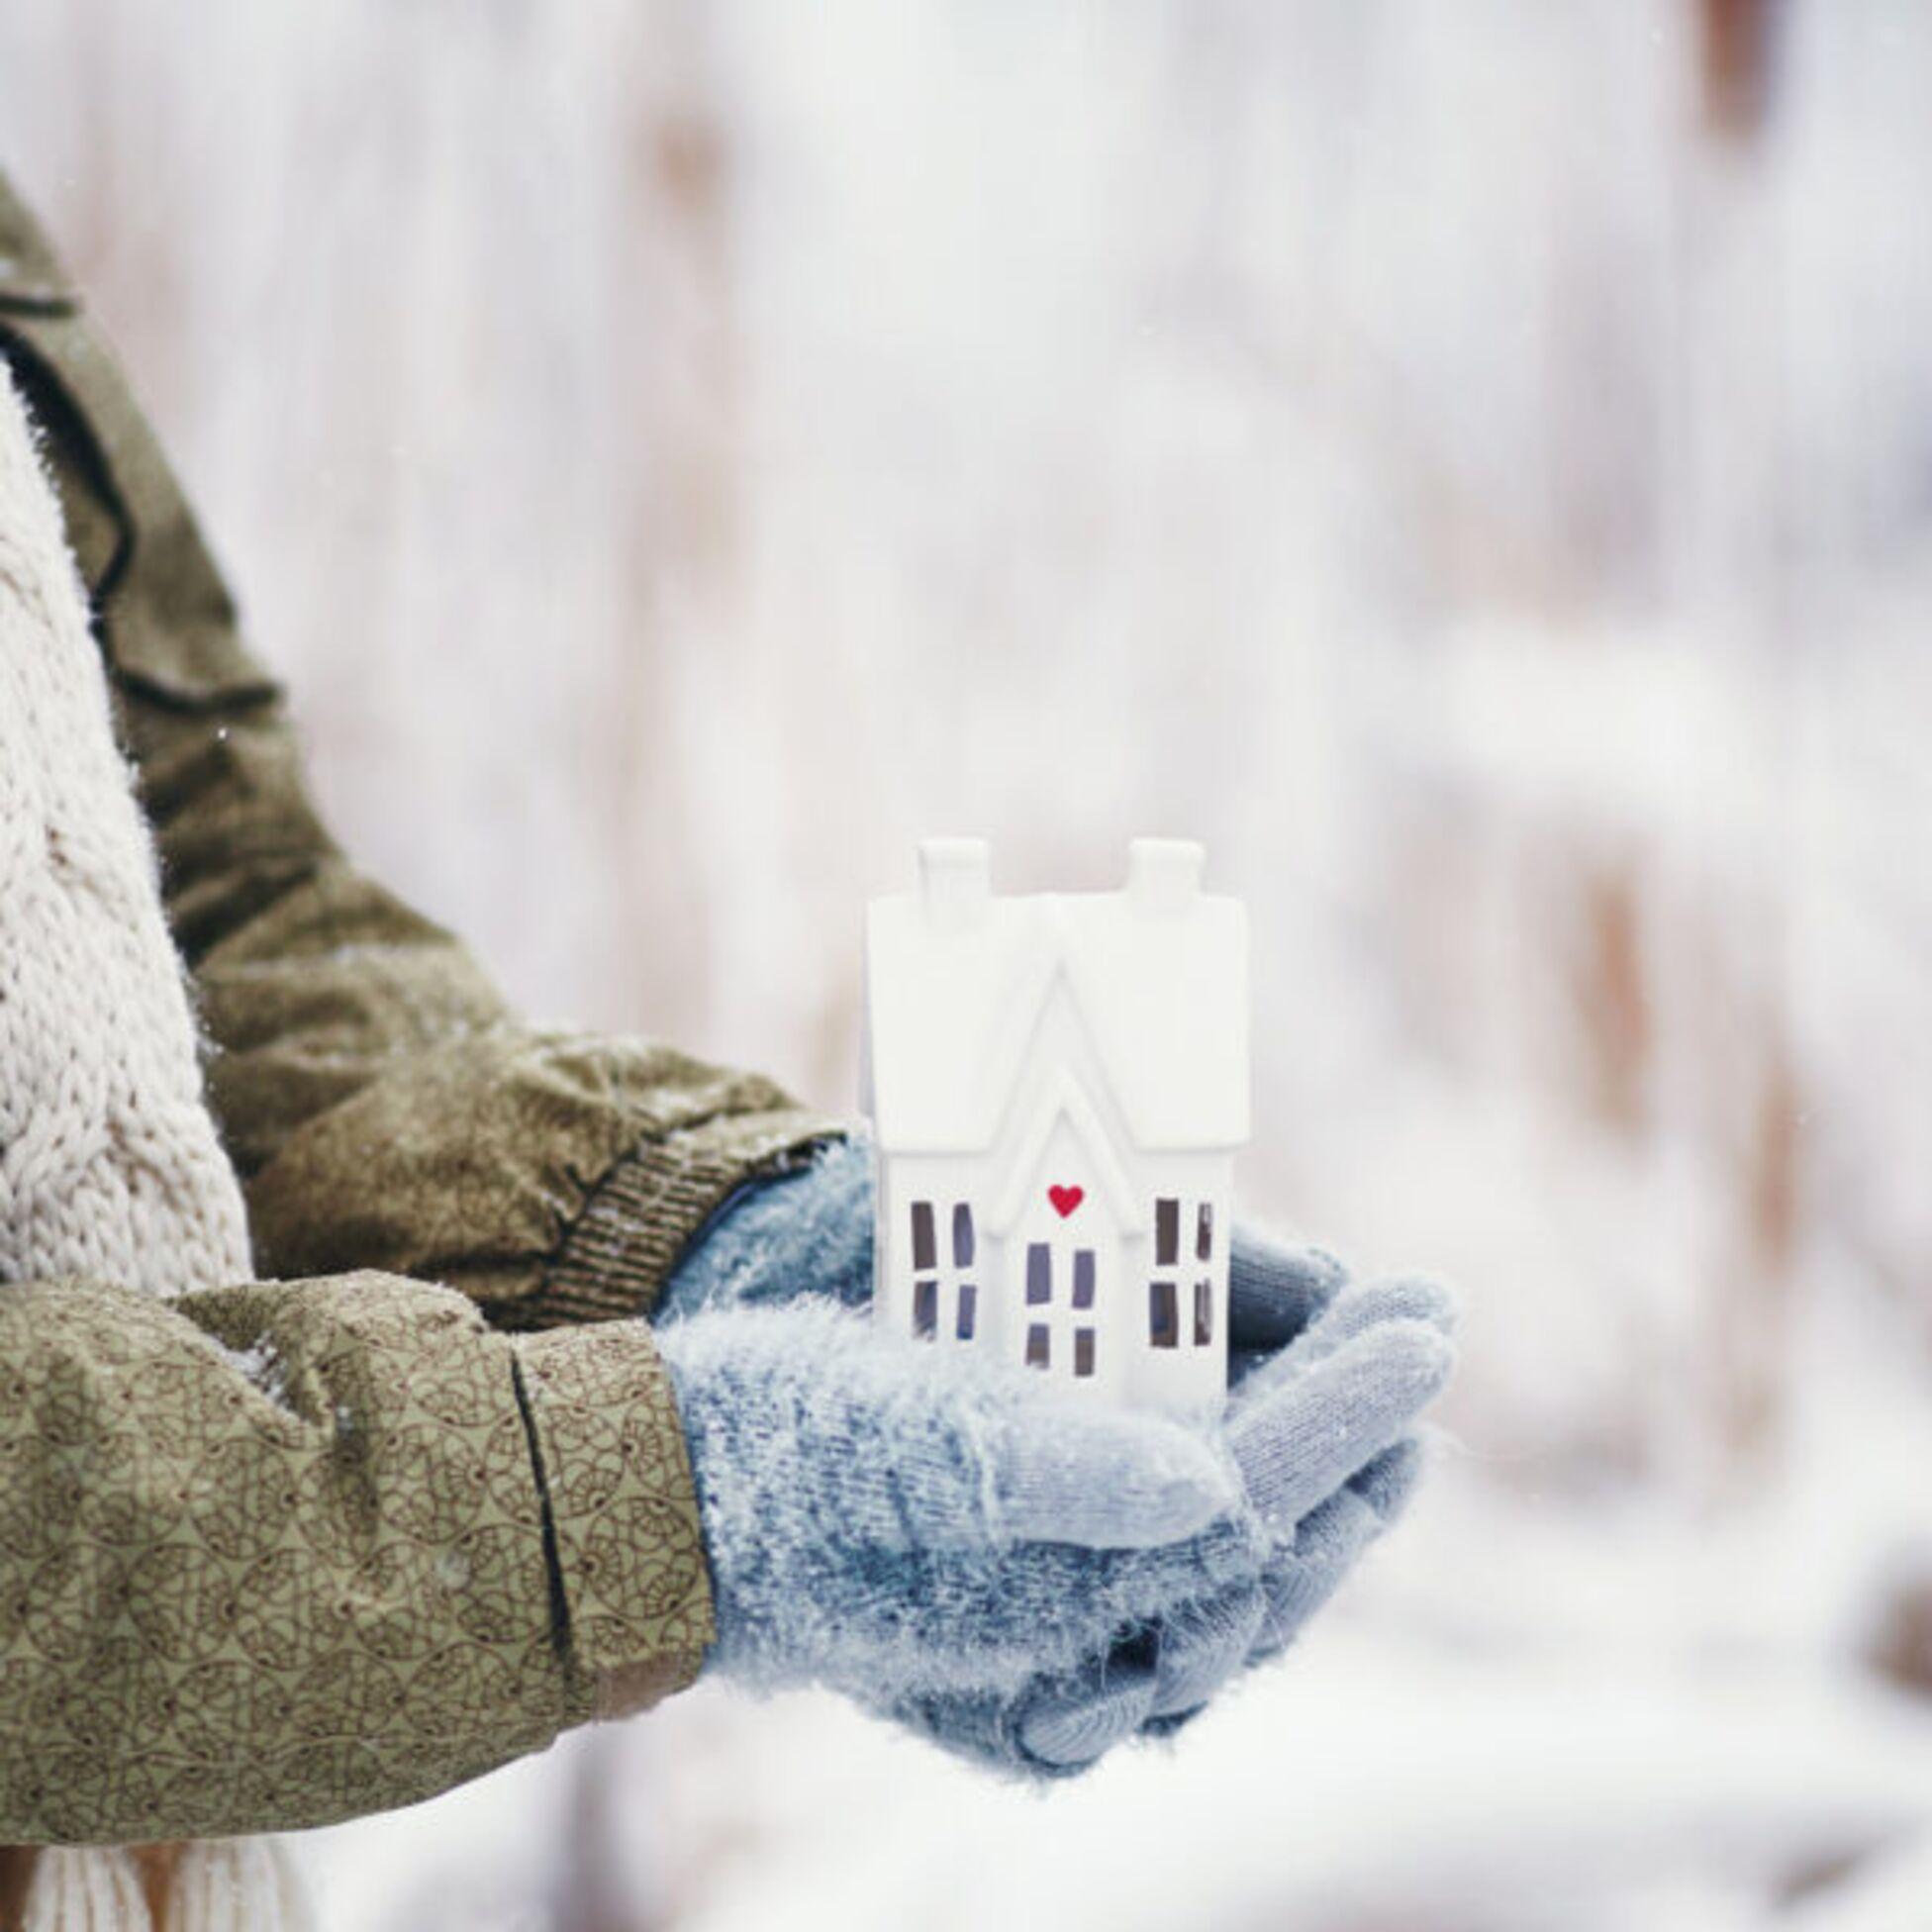 Umzug im Winter